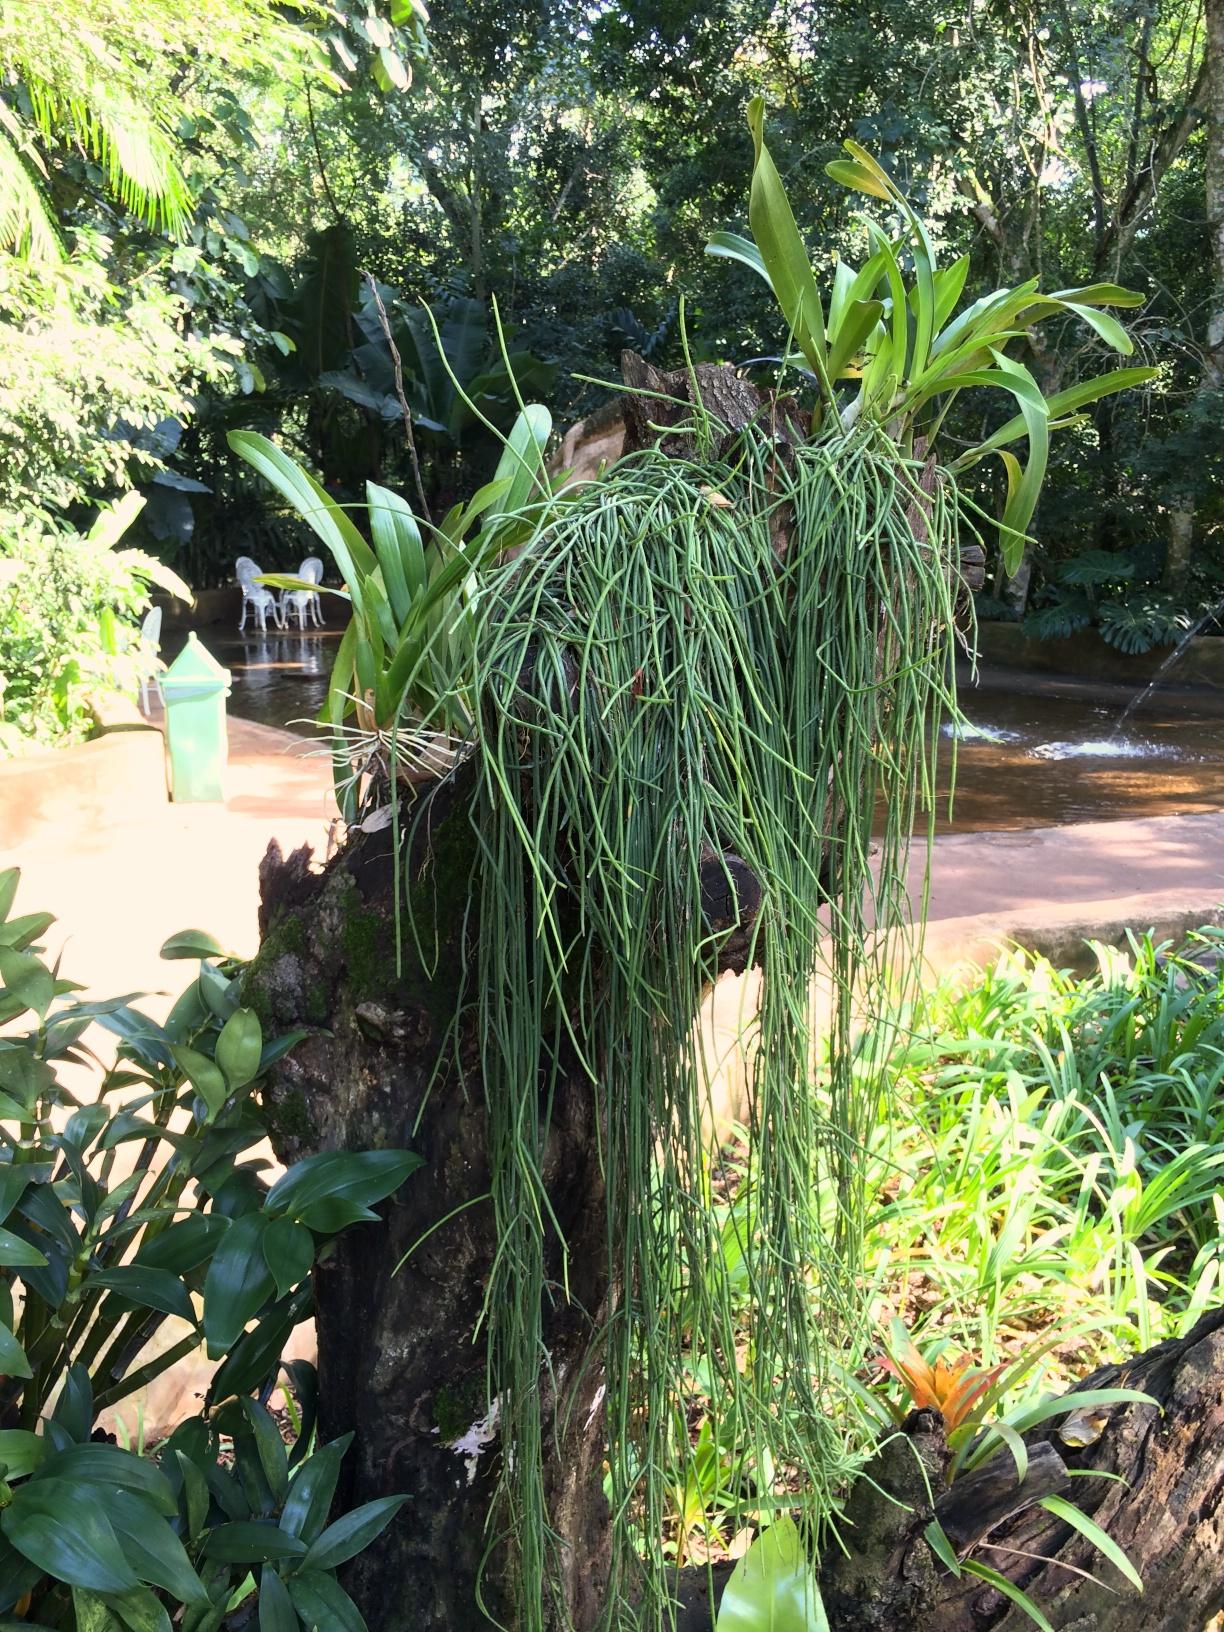 Bird Sanctuary, Foz do Iguacu, Brazil: Orchids and Rhipsalis (a succulent type of epiphyte), draped on a stump